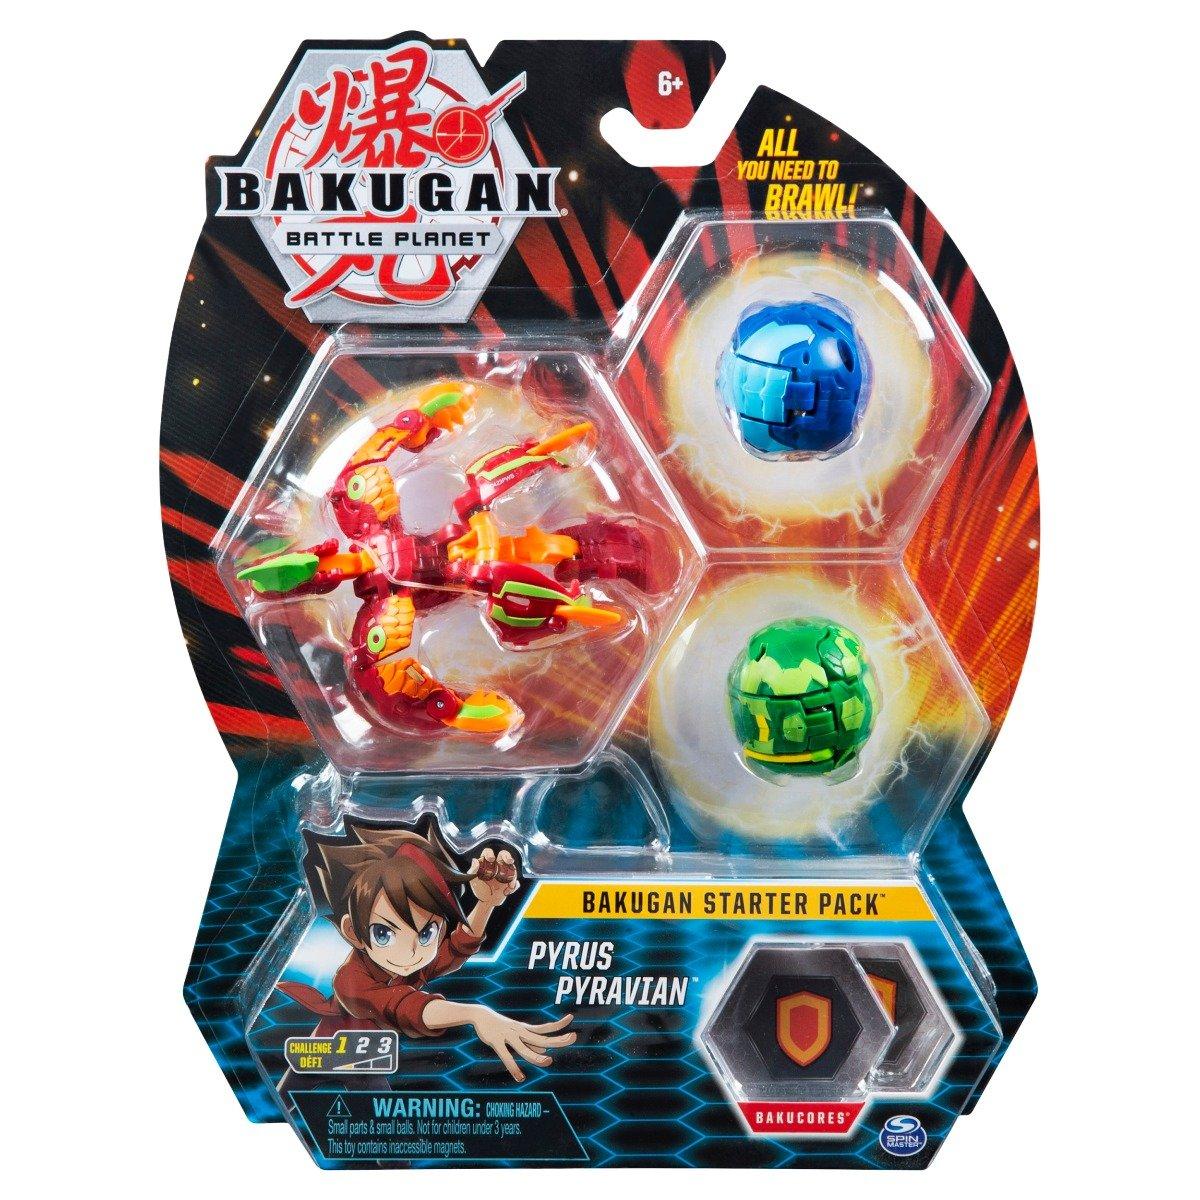 Set Bakugan Battle Planet Starter Pack, Pyrus Pyravian, 20118475